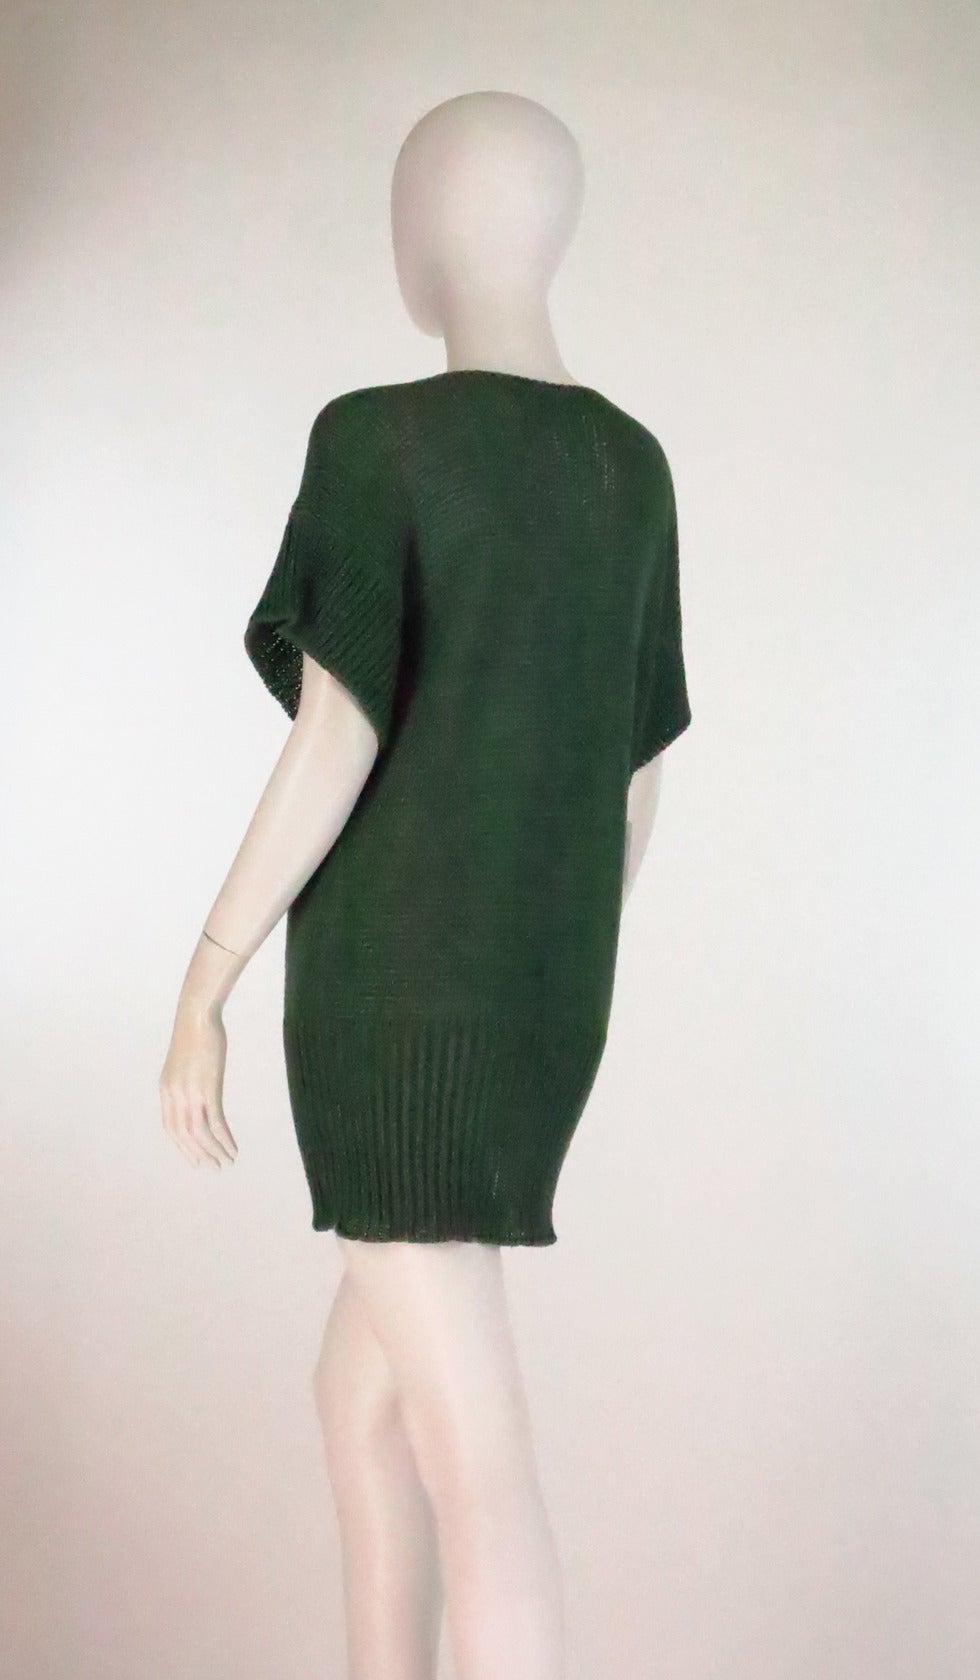 1980s Jil Sander pine green sweater knit tunic 3